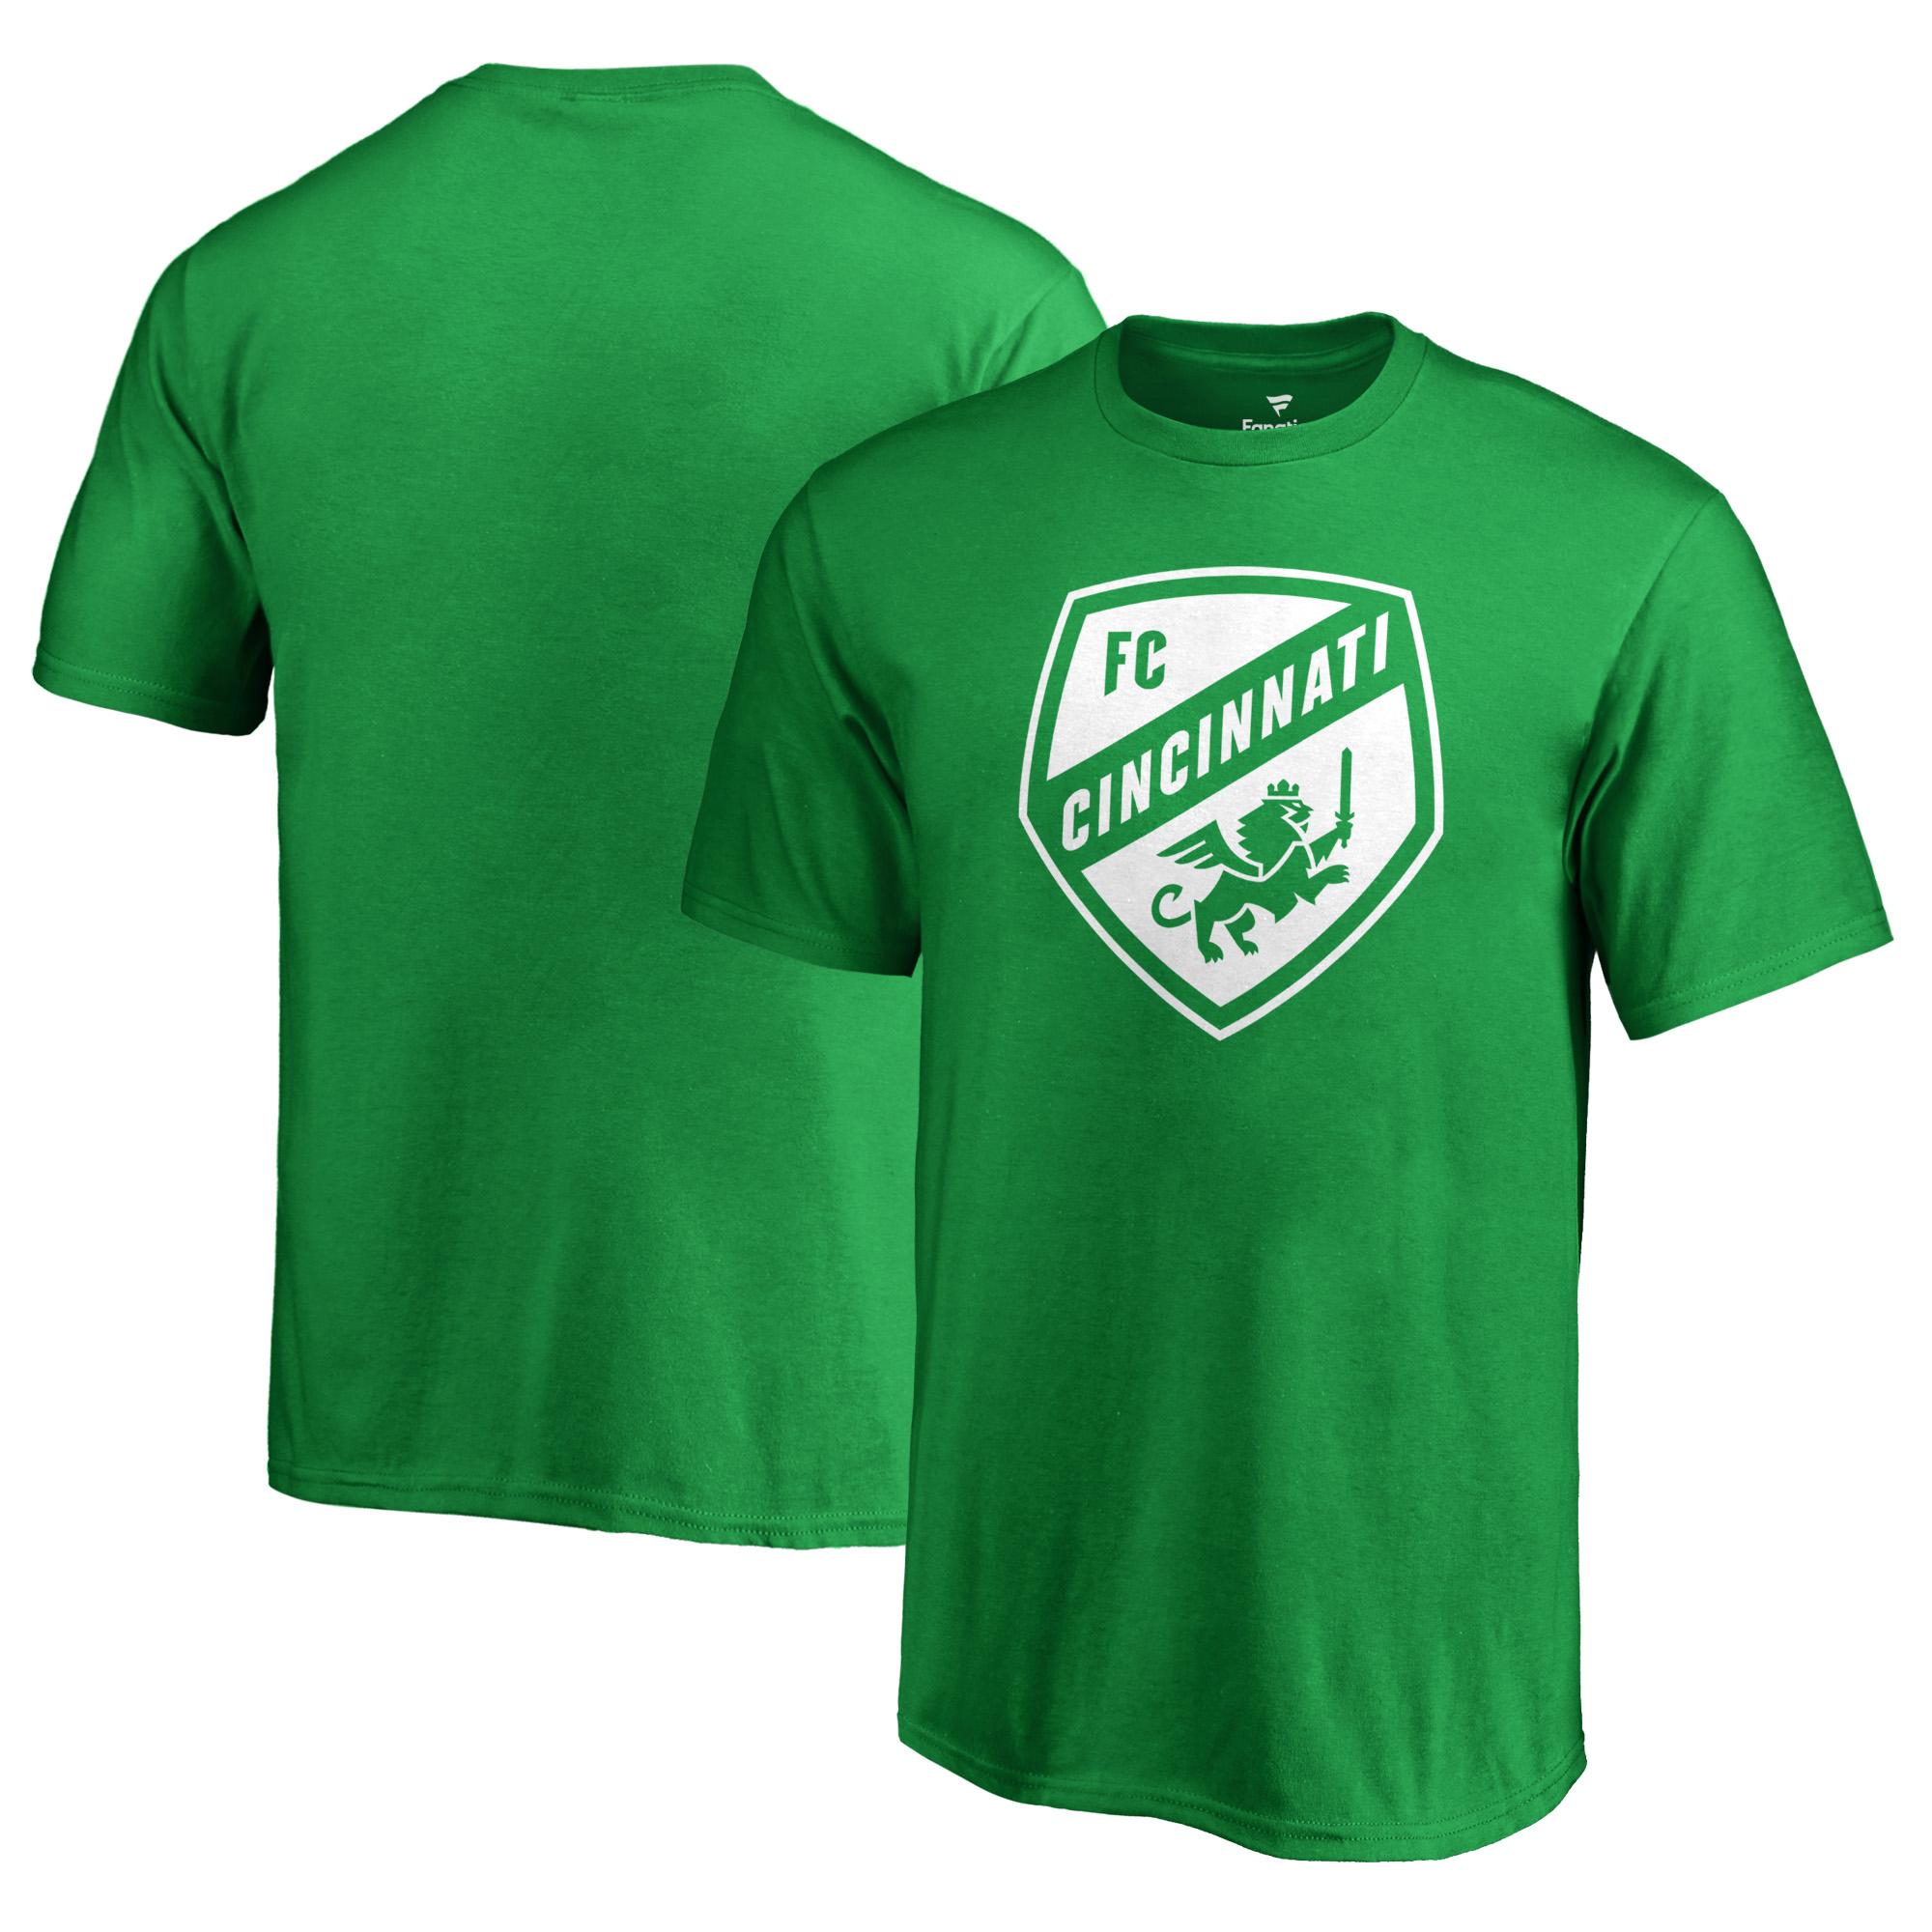 FC Cincinnati Fanatics Branded Youth St. Patrick's White Logo T-Shirt - Kelly Green